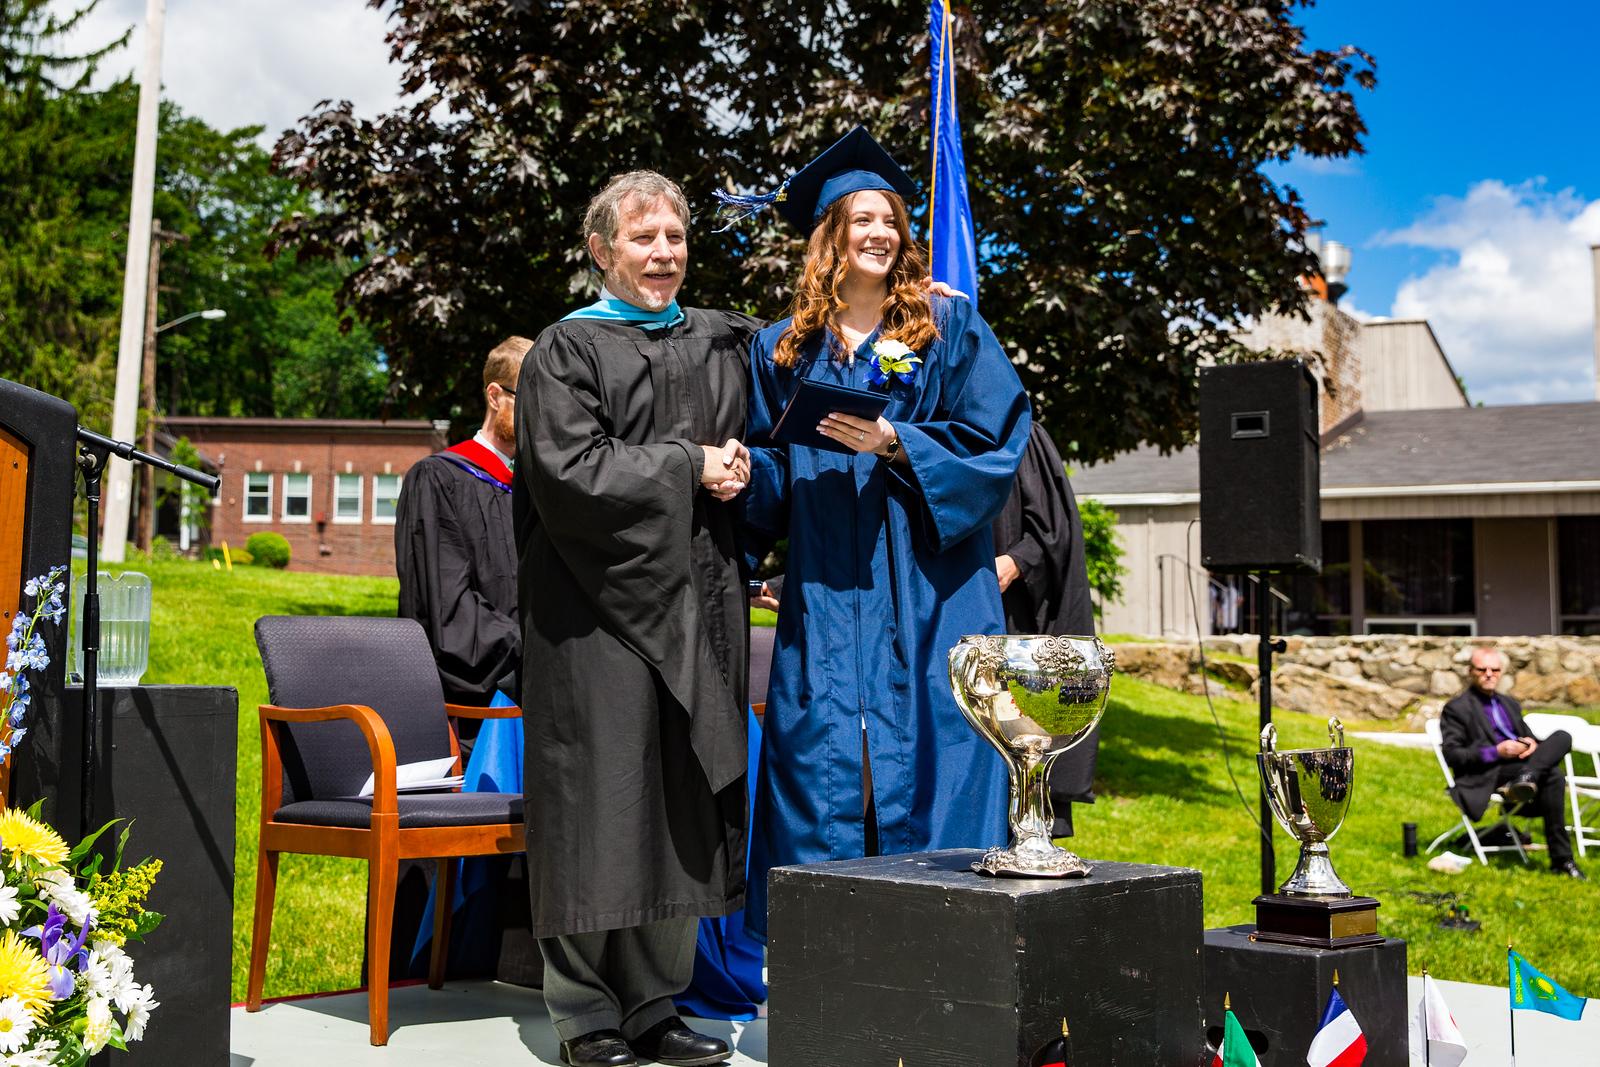 Headmaster Lamb poses with graduate Sara Smith